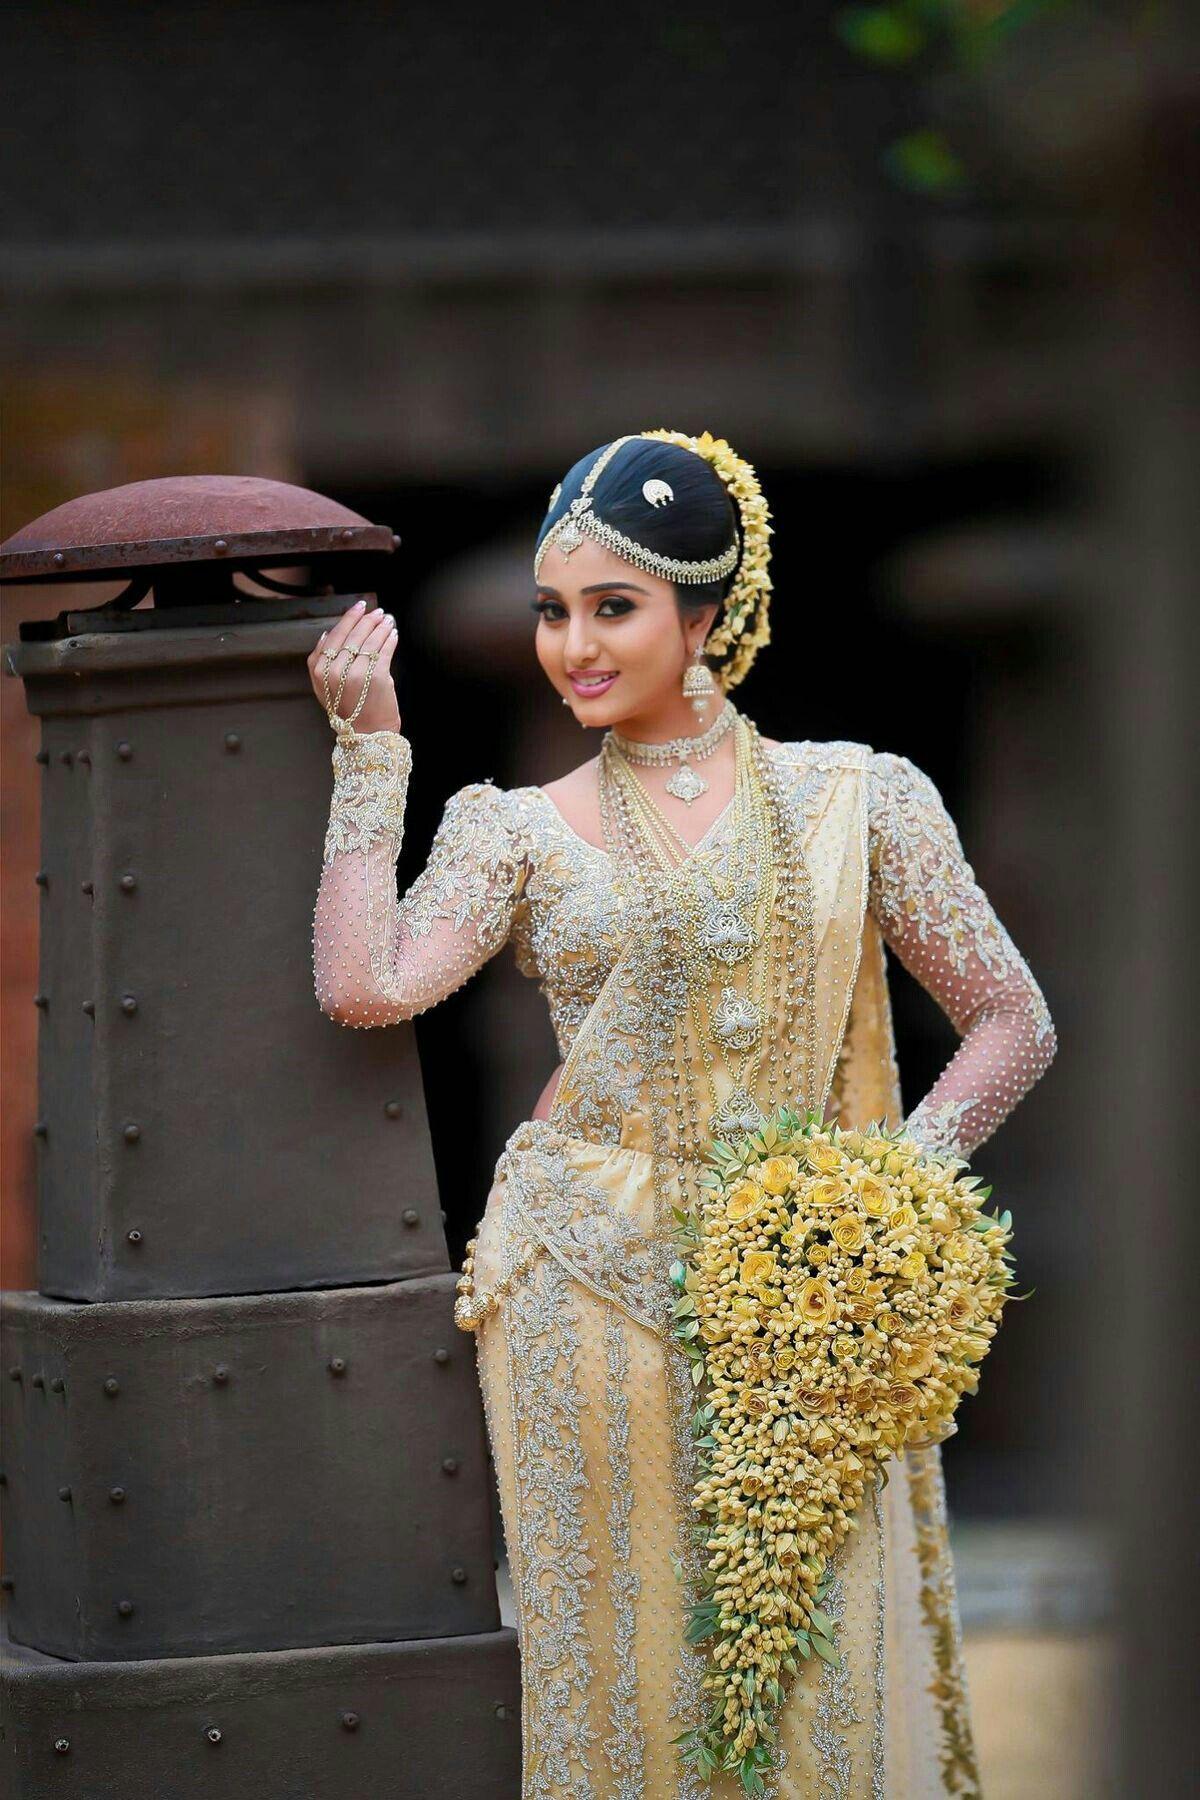 Traditional Sri Lankan bride | Loganadan Ps | Pinterest